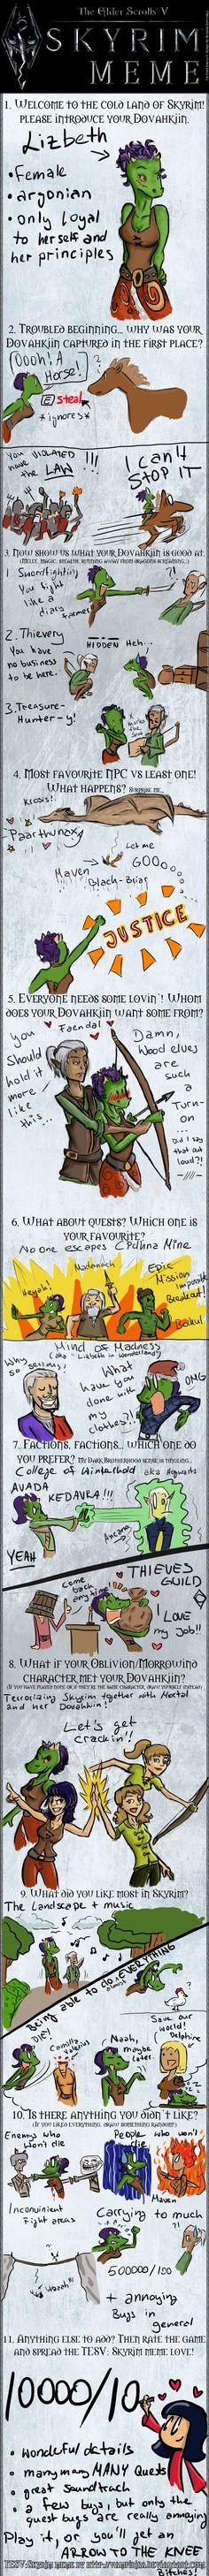 Skyrim Meme by Lizzie the Lizardborn by LizbethLizard on DeviantArt